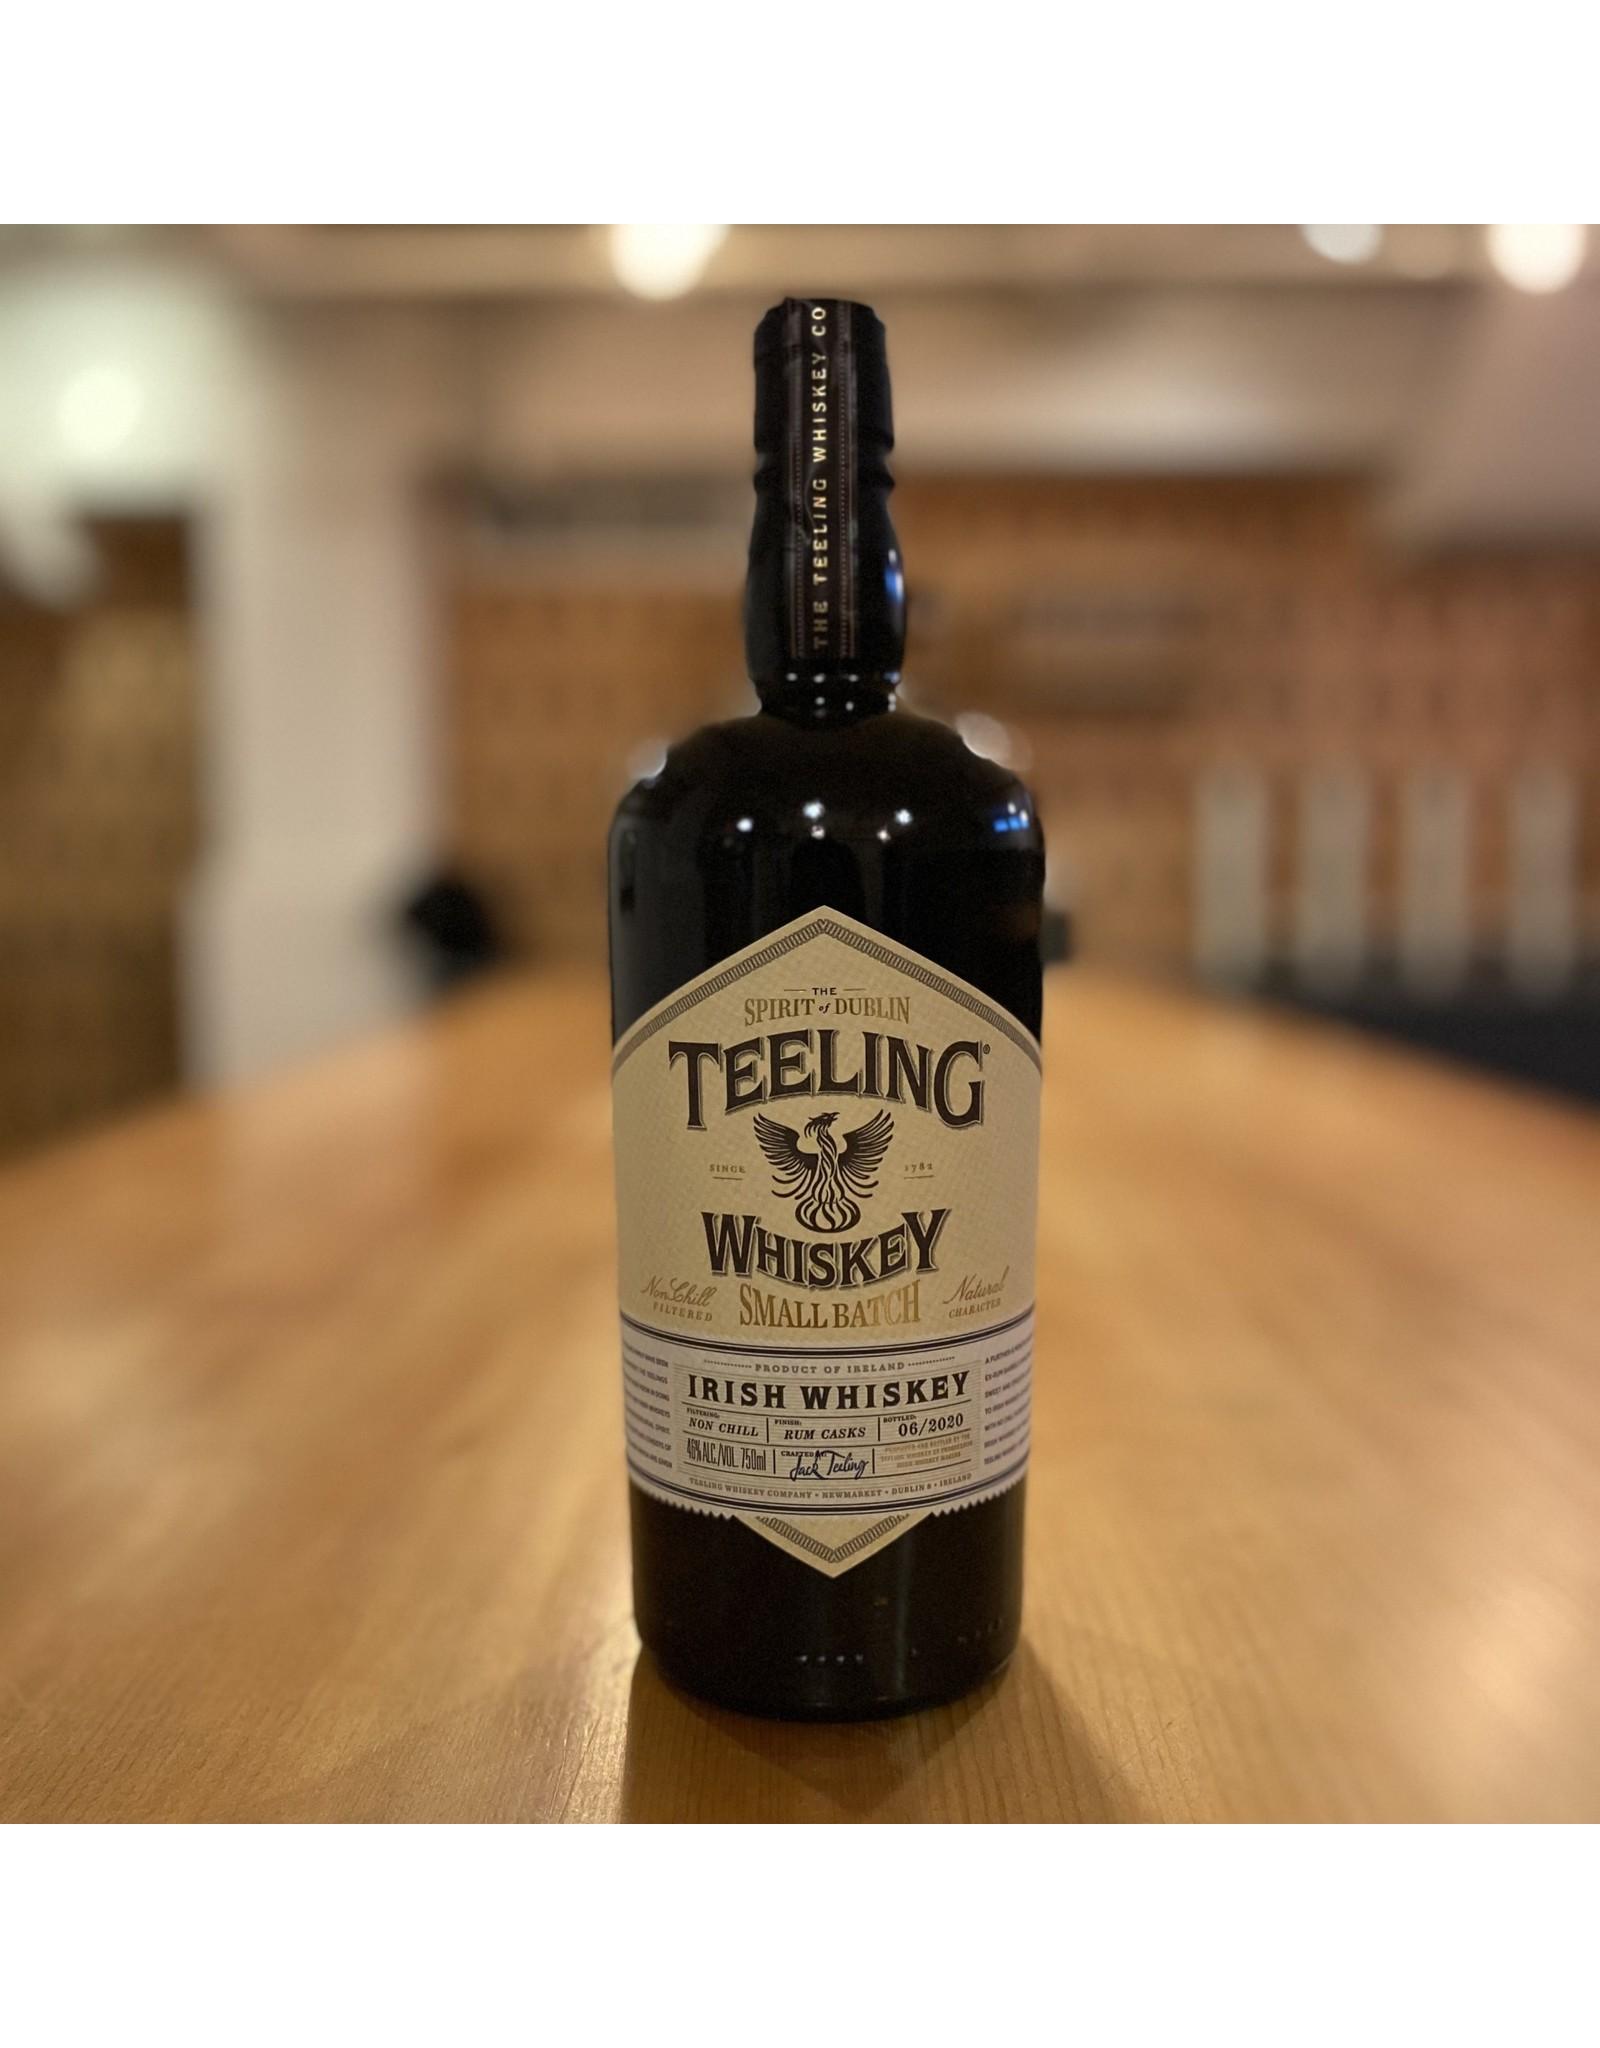 The Teeling Whiskey Co Small Batch Irish Whiskey 750ml - Ireland